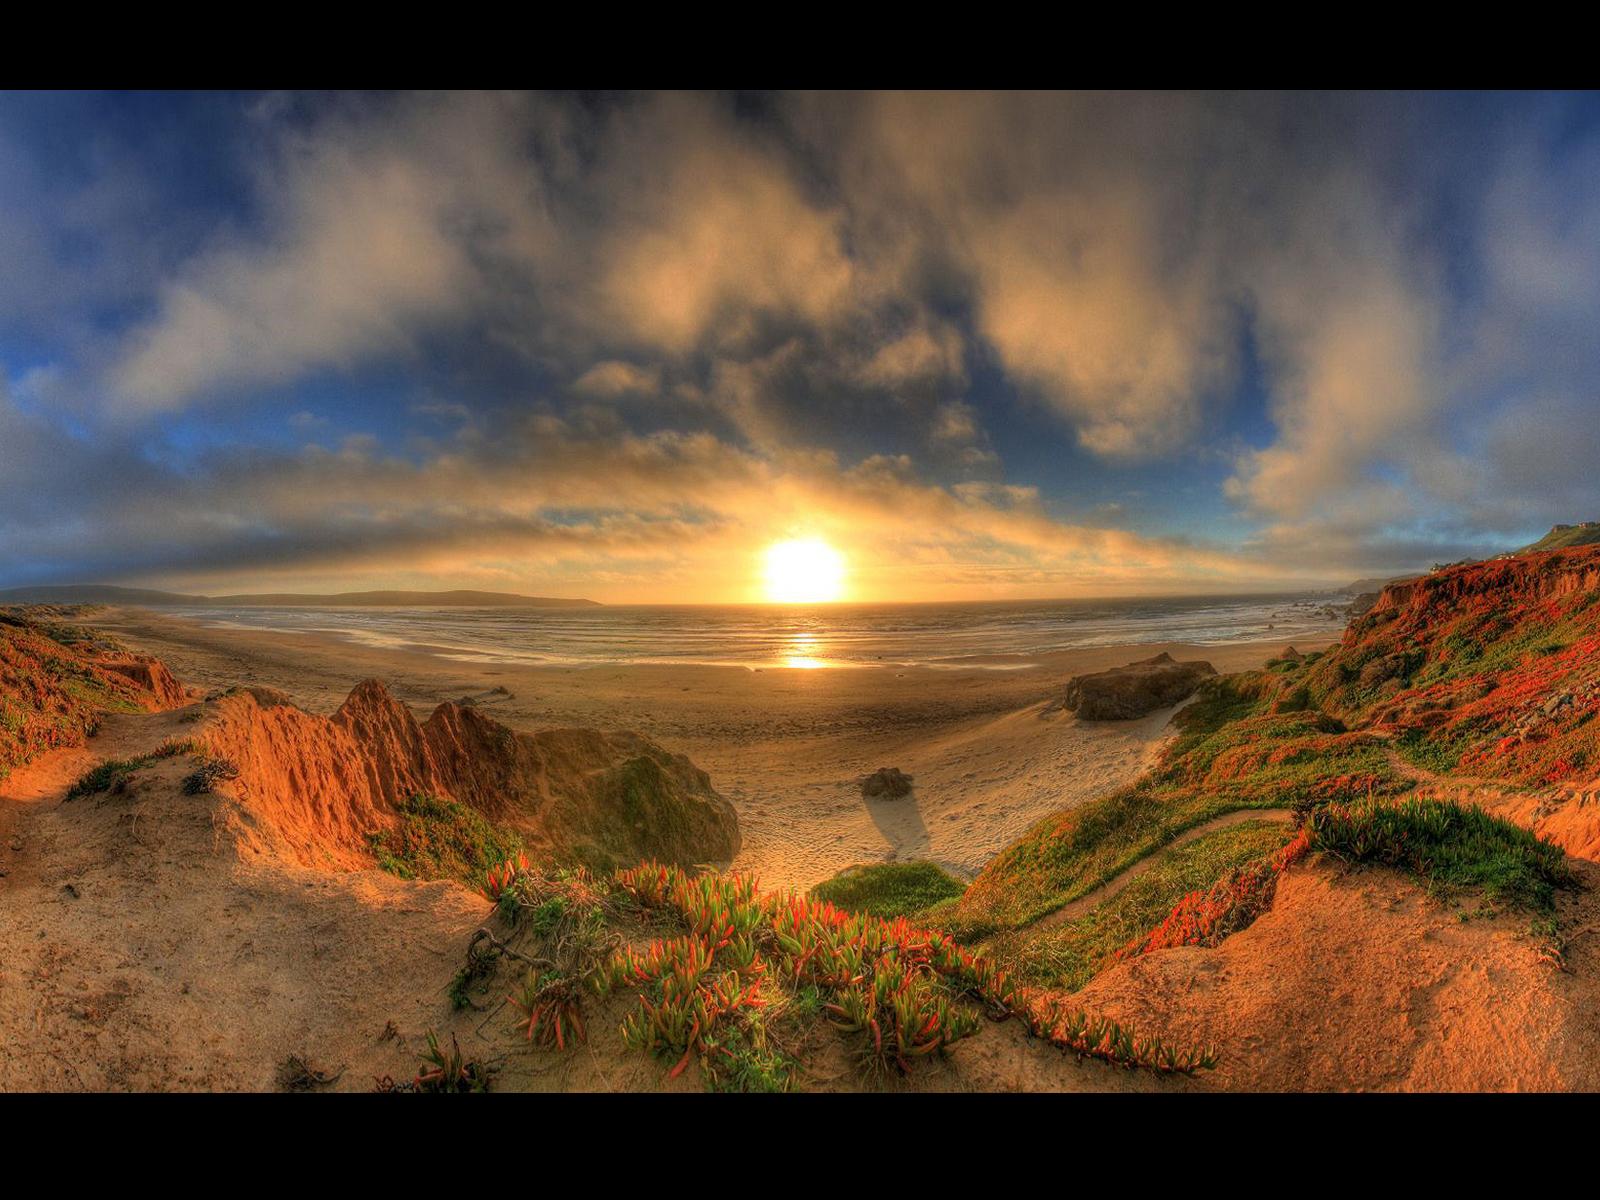 http://3.bp.blogspot.com/-8Cpv2BflXuk/UDGTkLROGVI/AAAAAAAAMWg/NLTufOl-yEA/s1600/Amazing_Landscapes_HD_Wallpapers_Collection_-48.jpeg